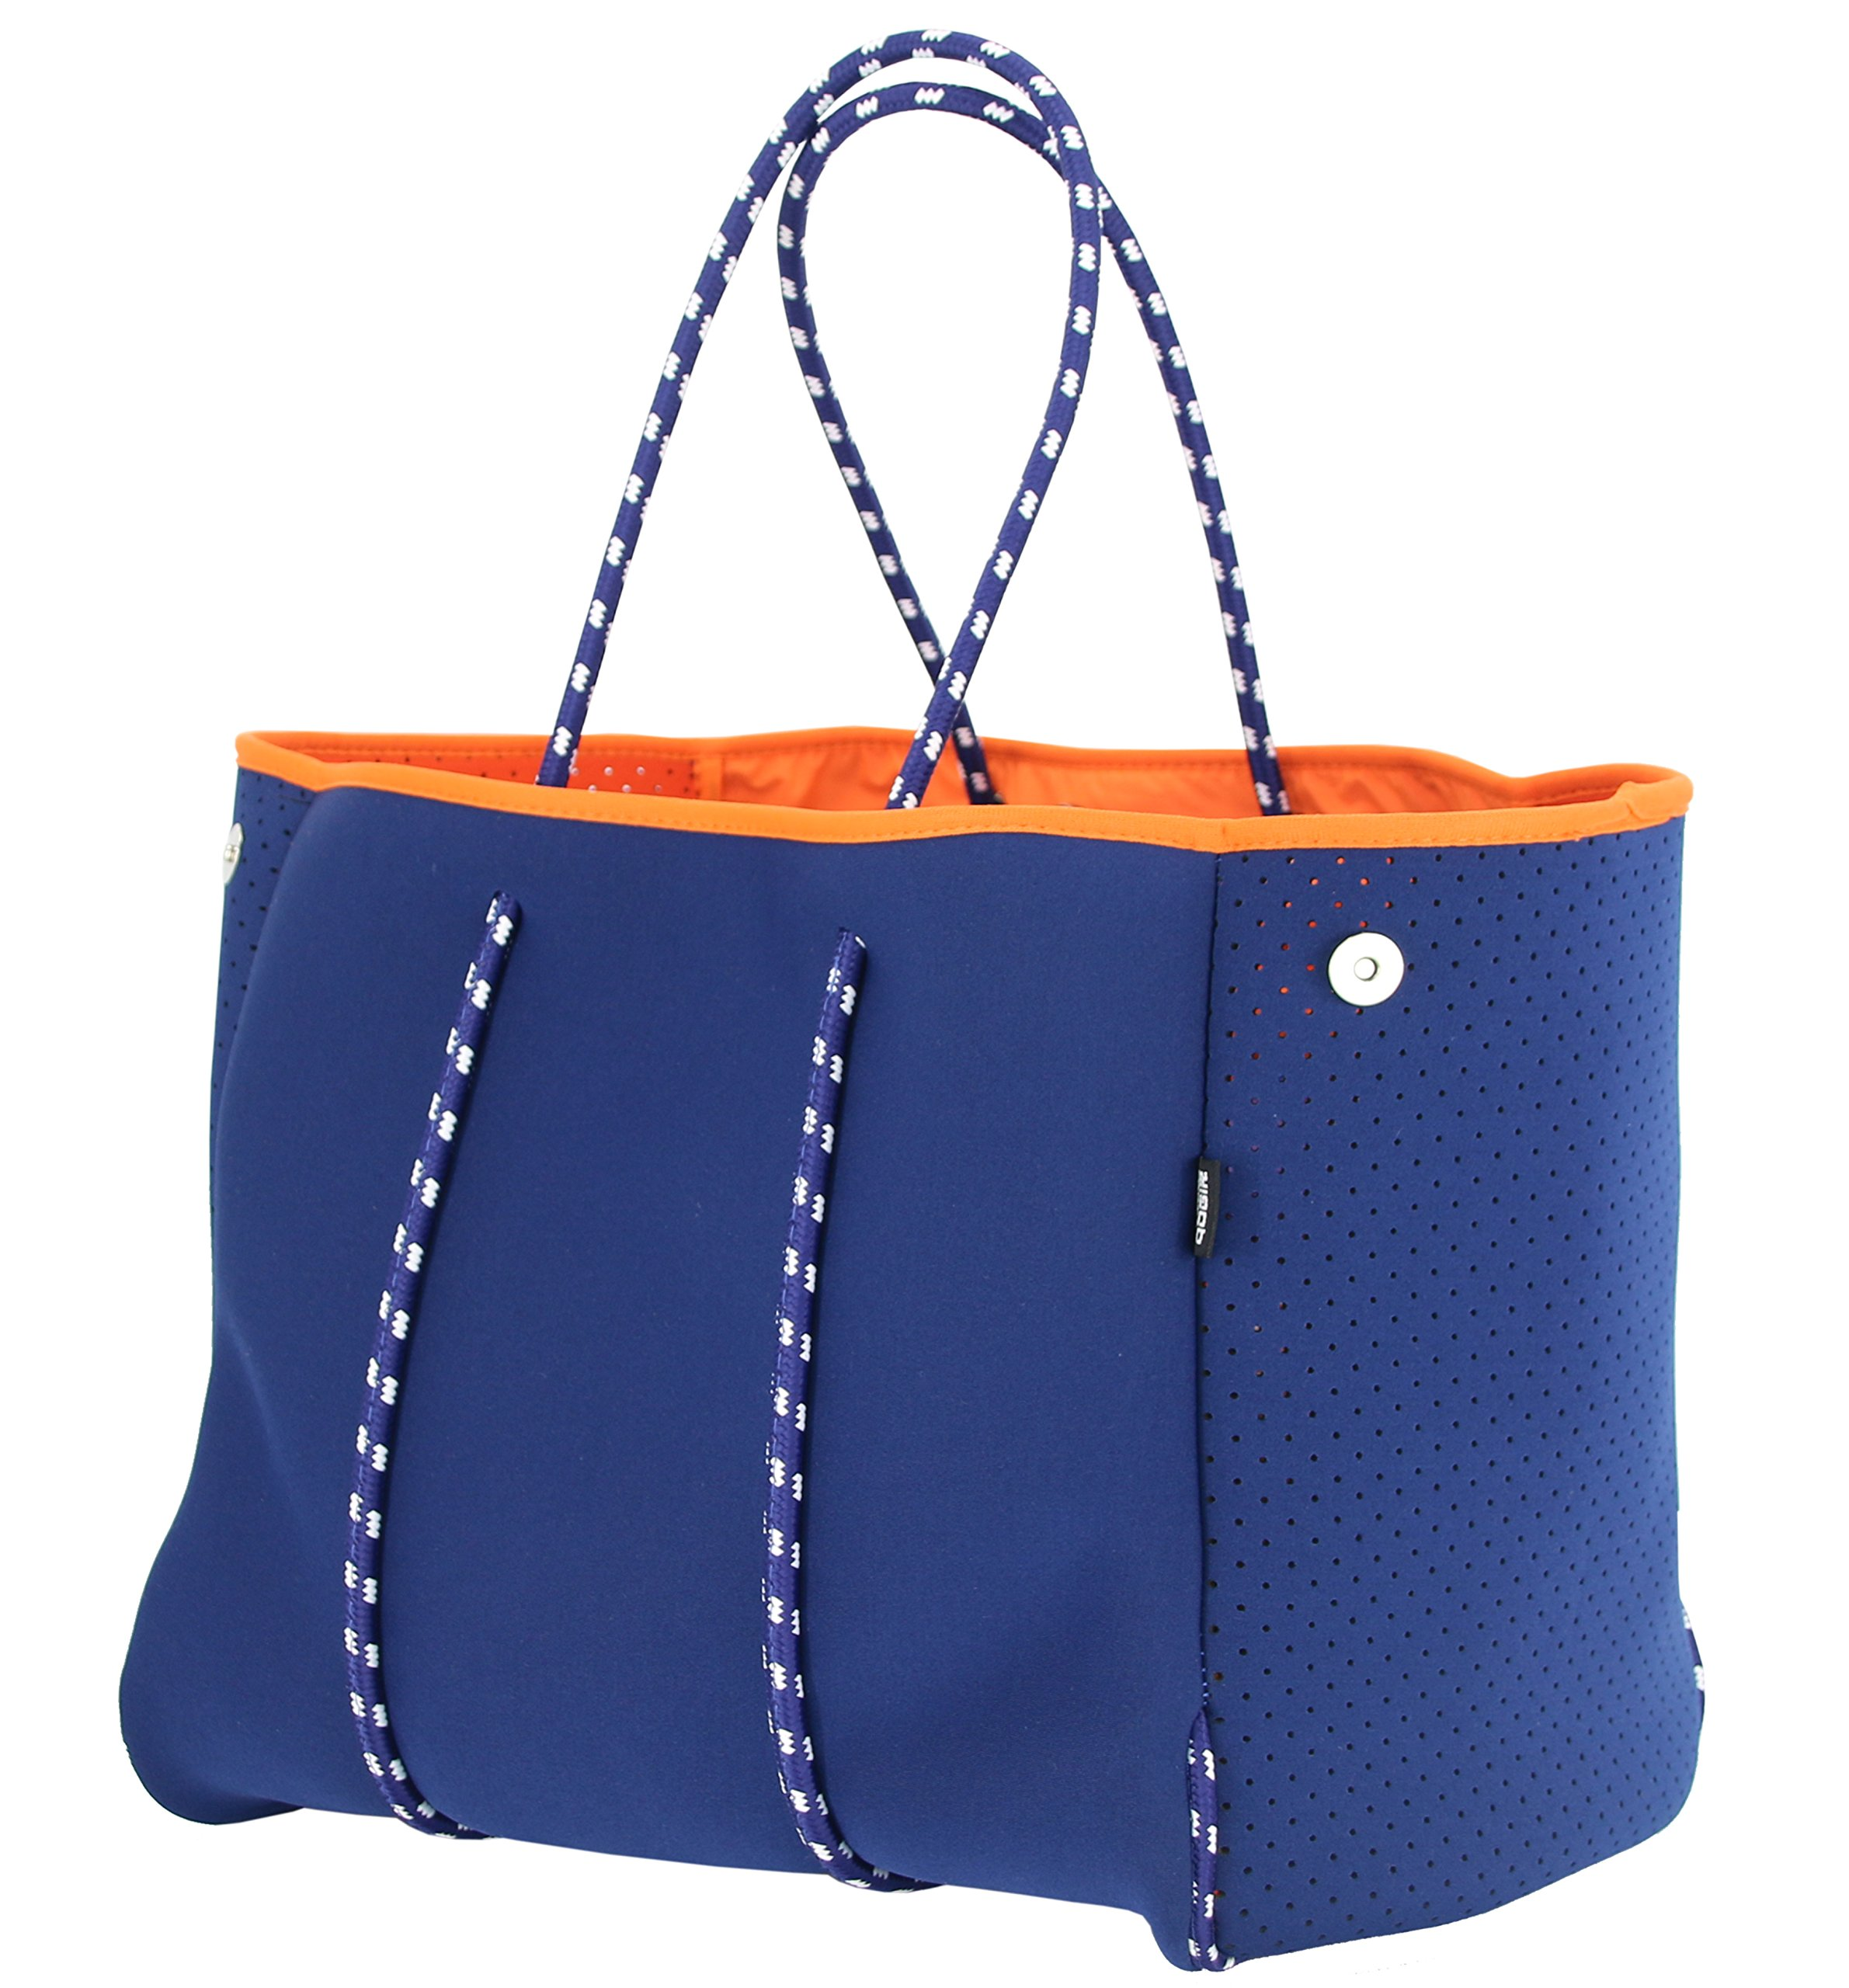 QOGiR Neoprene Multipurpose Beach Bag Tote with Inner Zipper Pocket and Movable Board (Large Dark Blue)